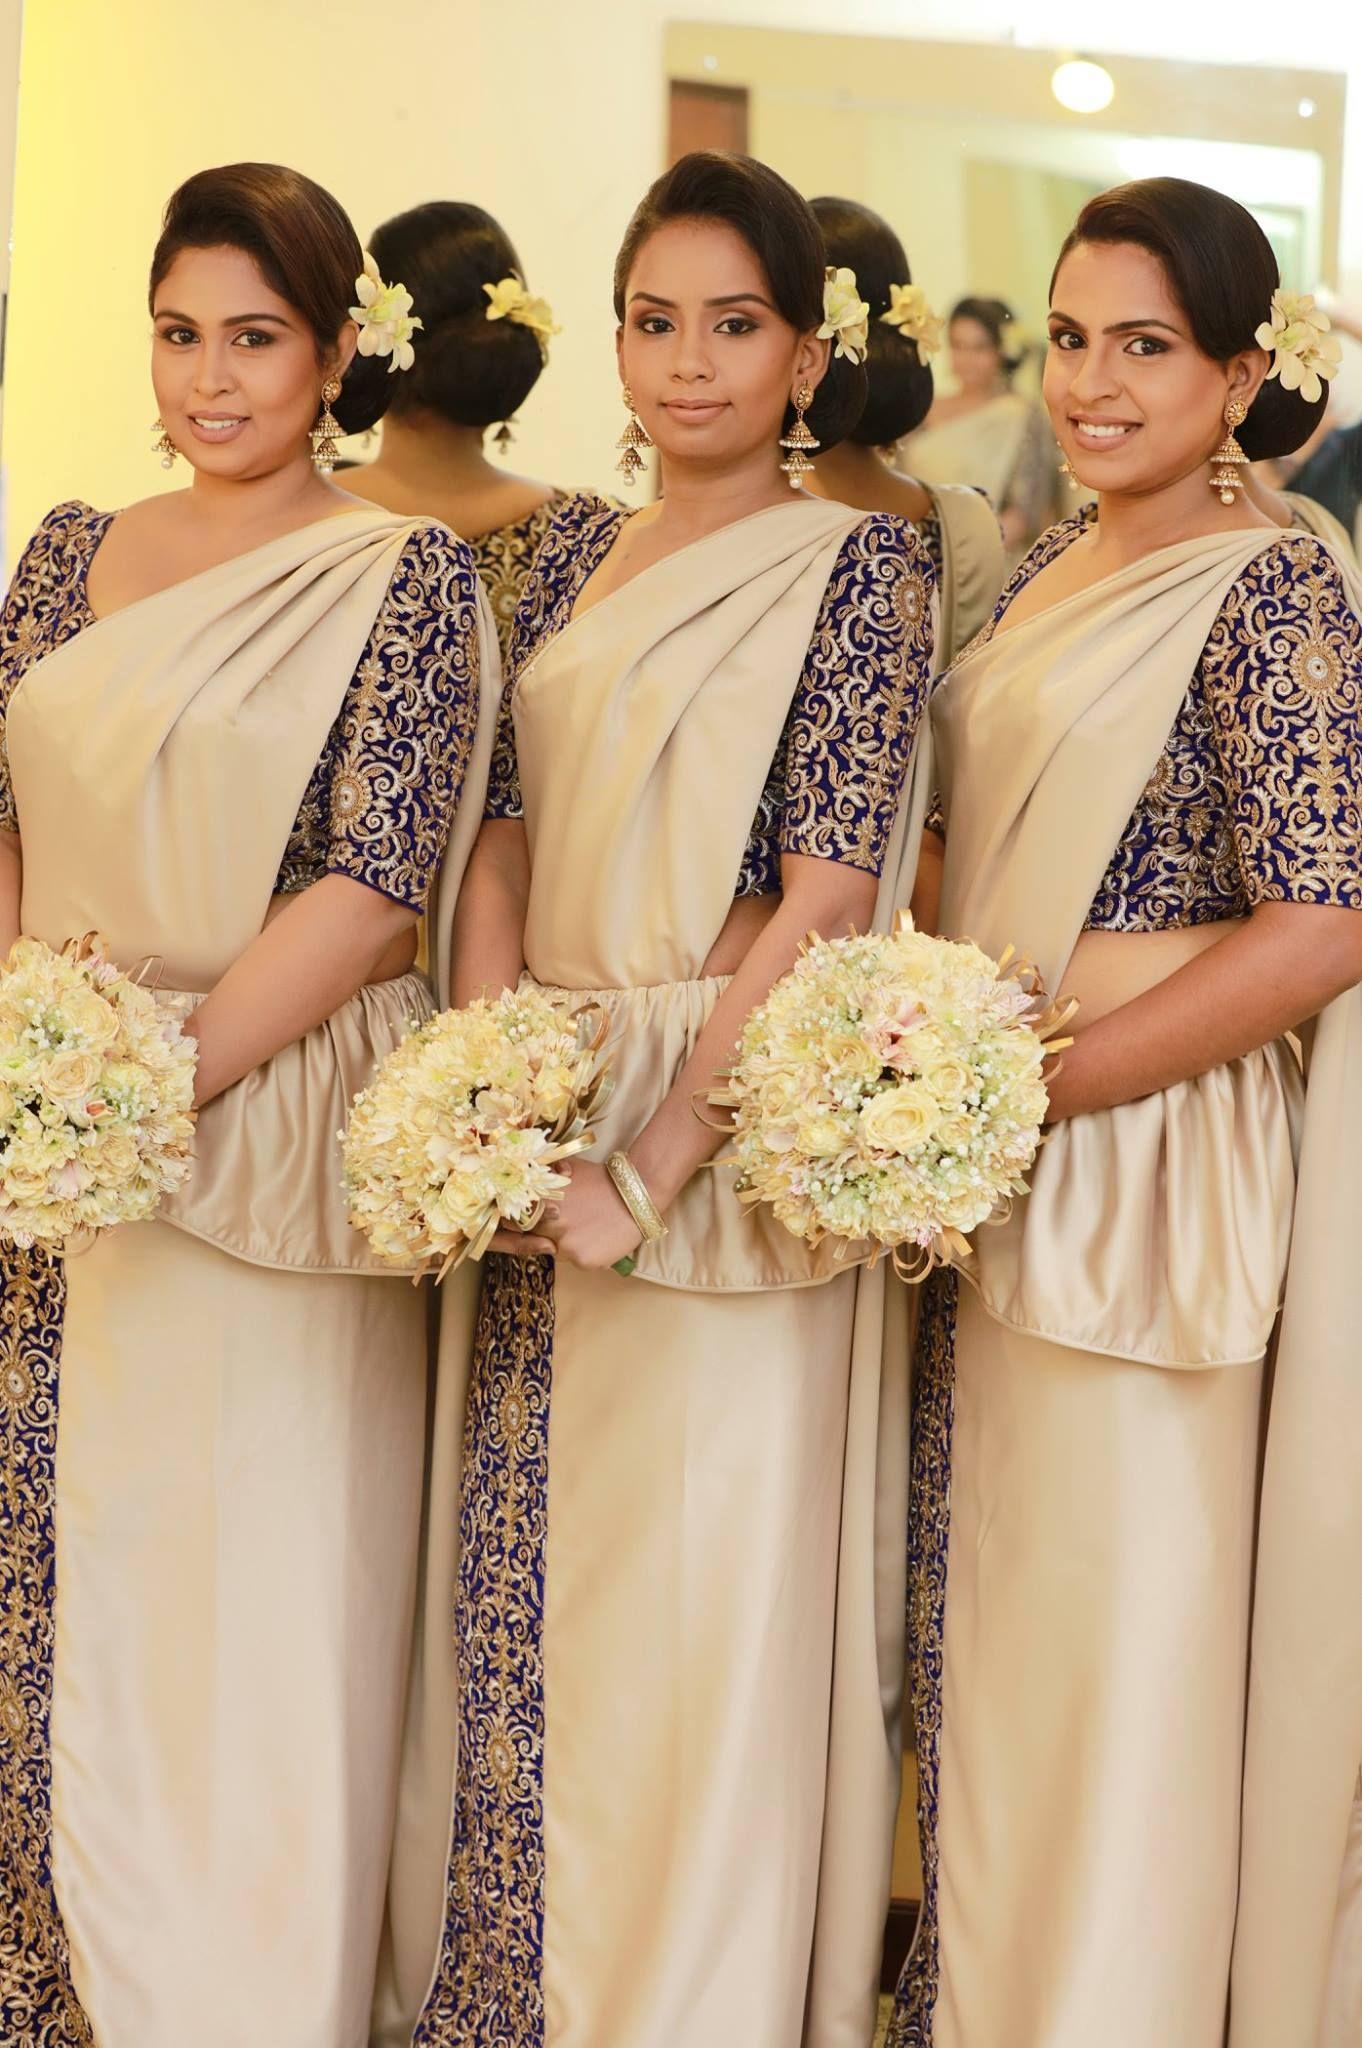 Hair makeup dressing indika bandara of inba sri for Wedding party dresses in sri lanka